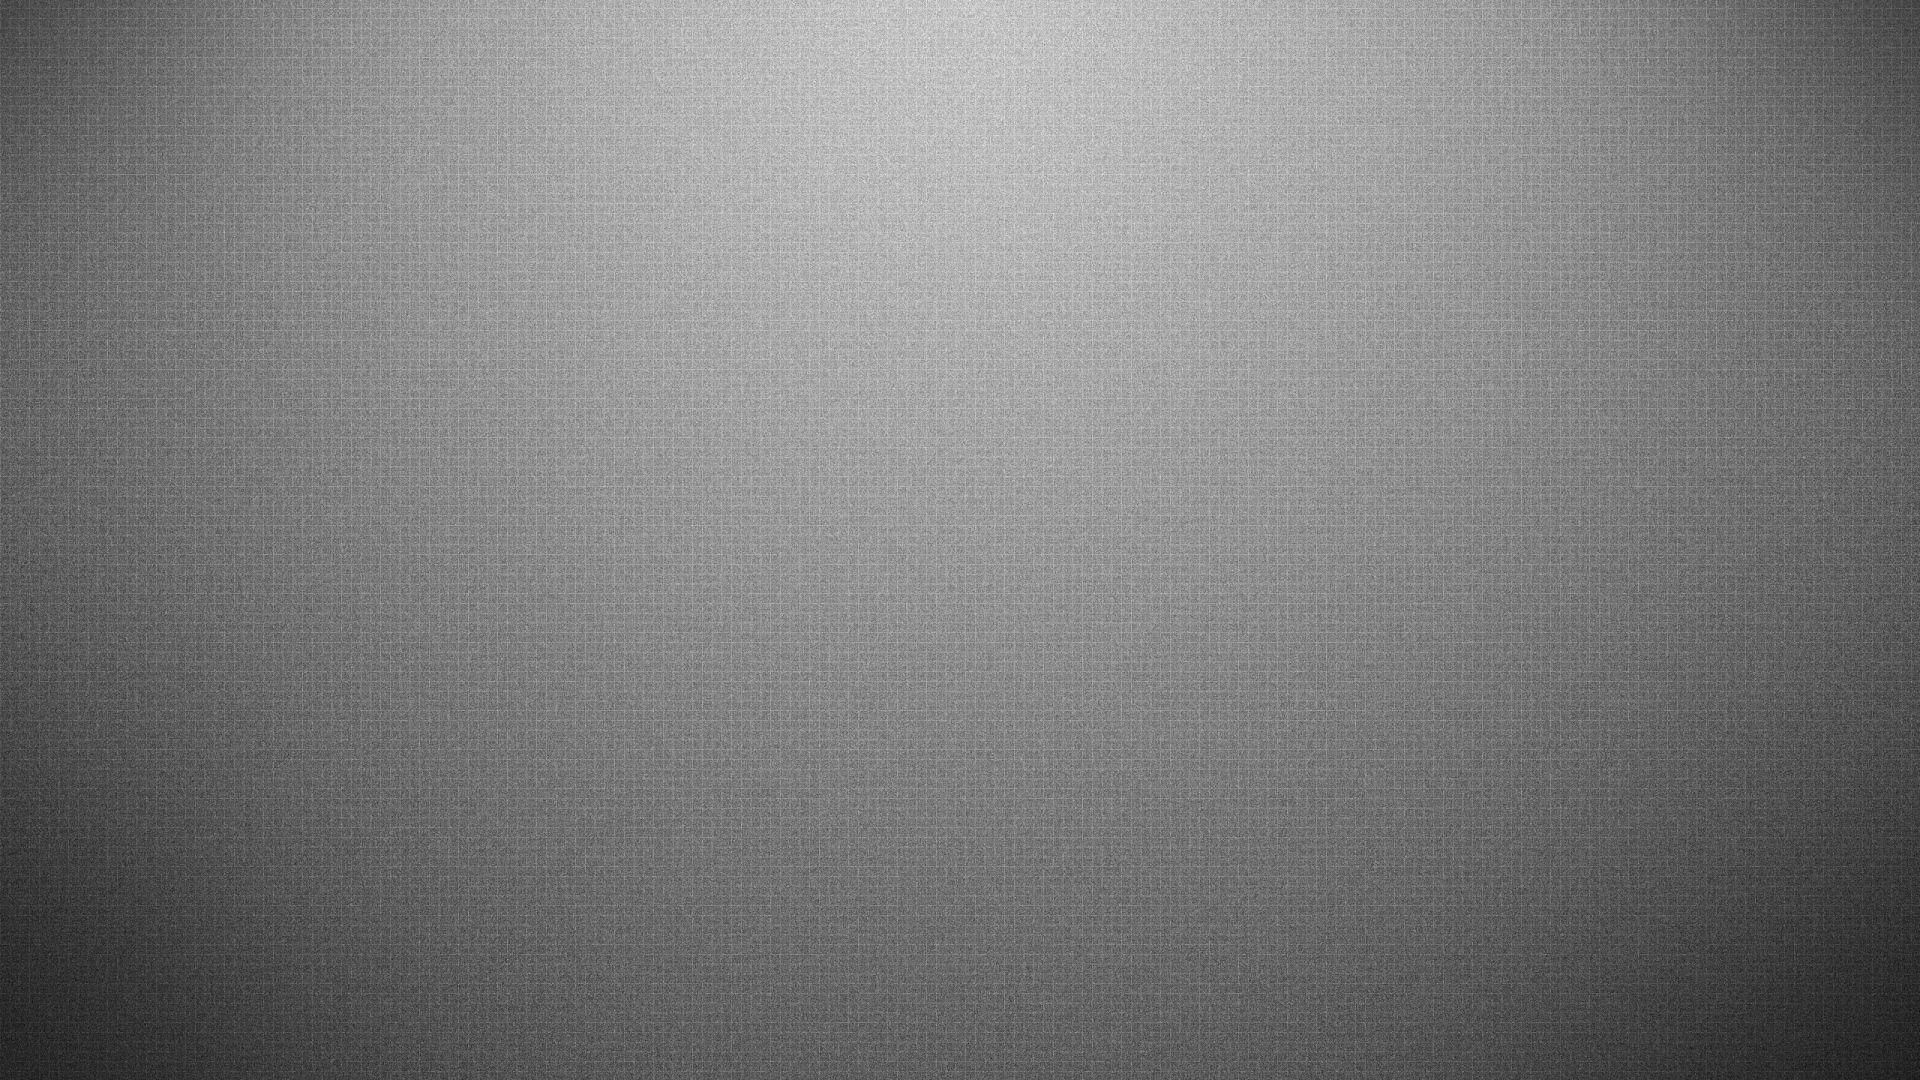 Download Wallpaper 1920x1080 Bright Background Light Texture Full Hd 1080p Hd Background Warna Abu Abu Latar Belakang